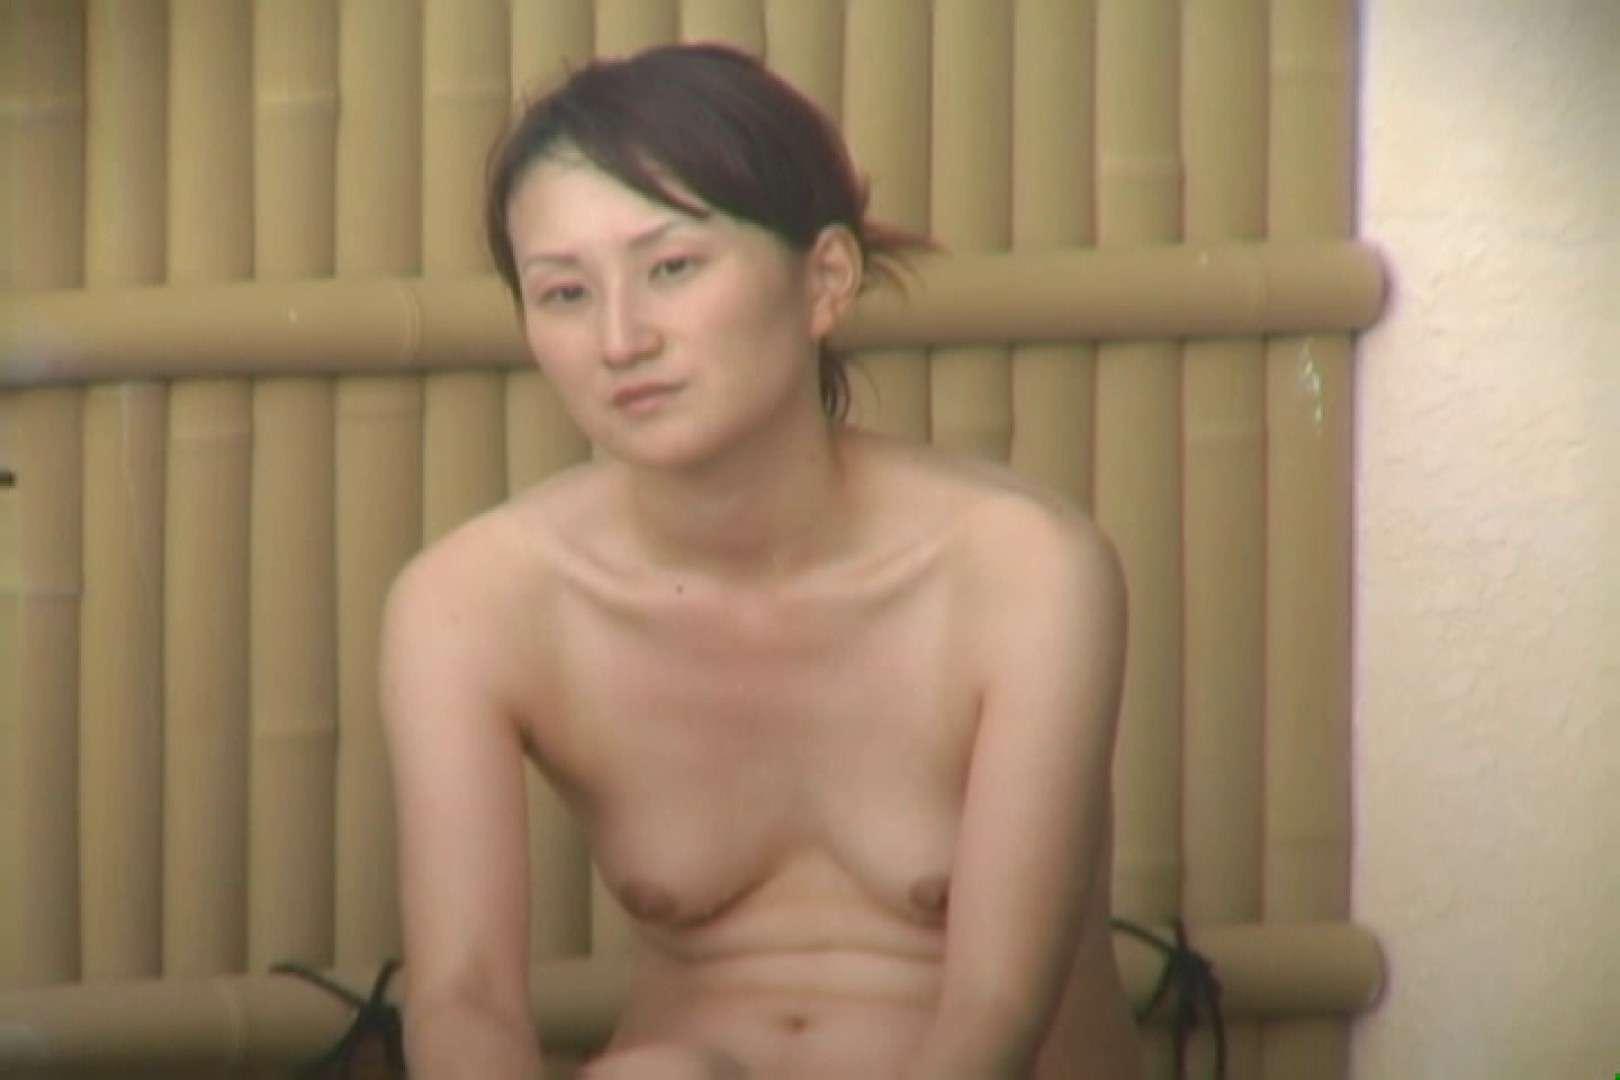 Aquaな露天風呂Vol.578 盗撮師作品  70pic 48